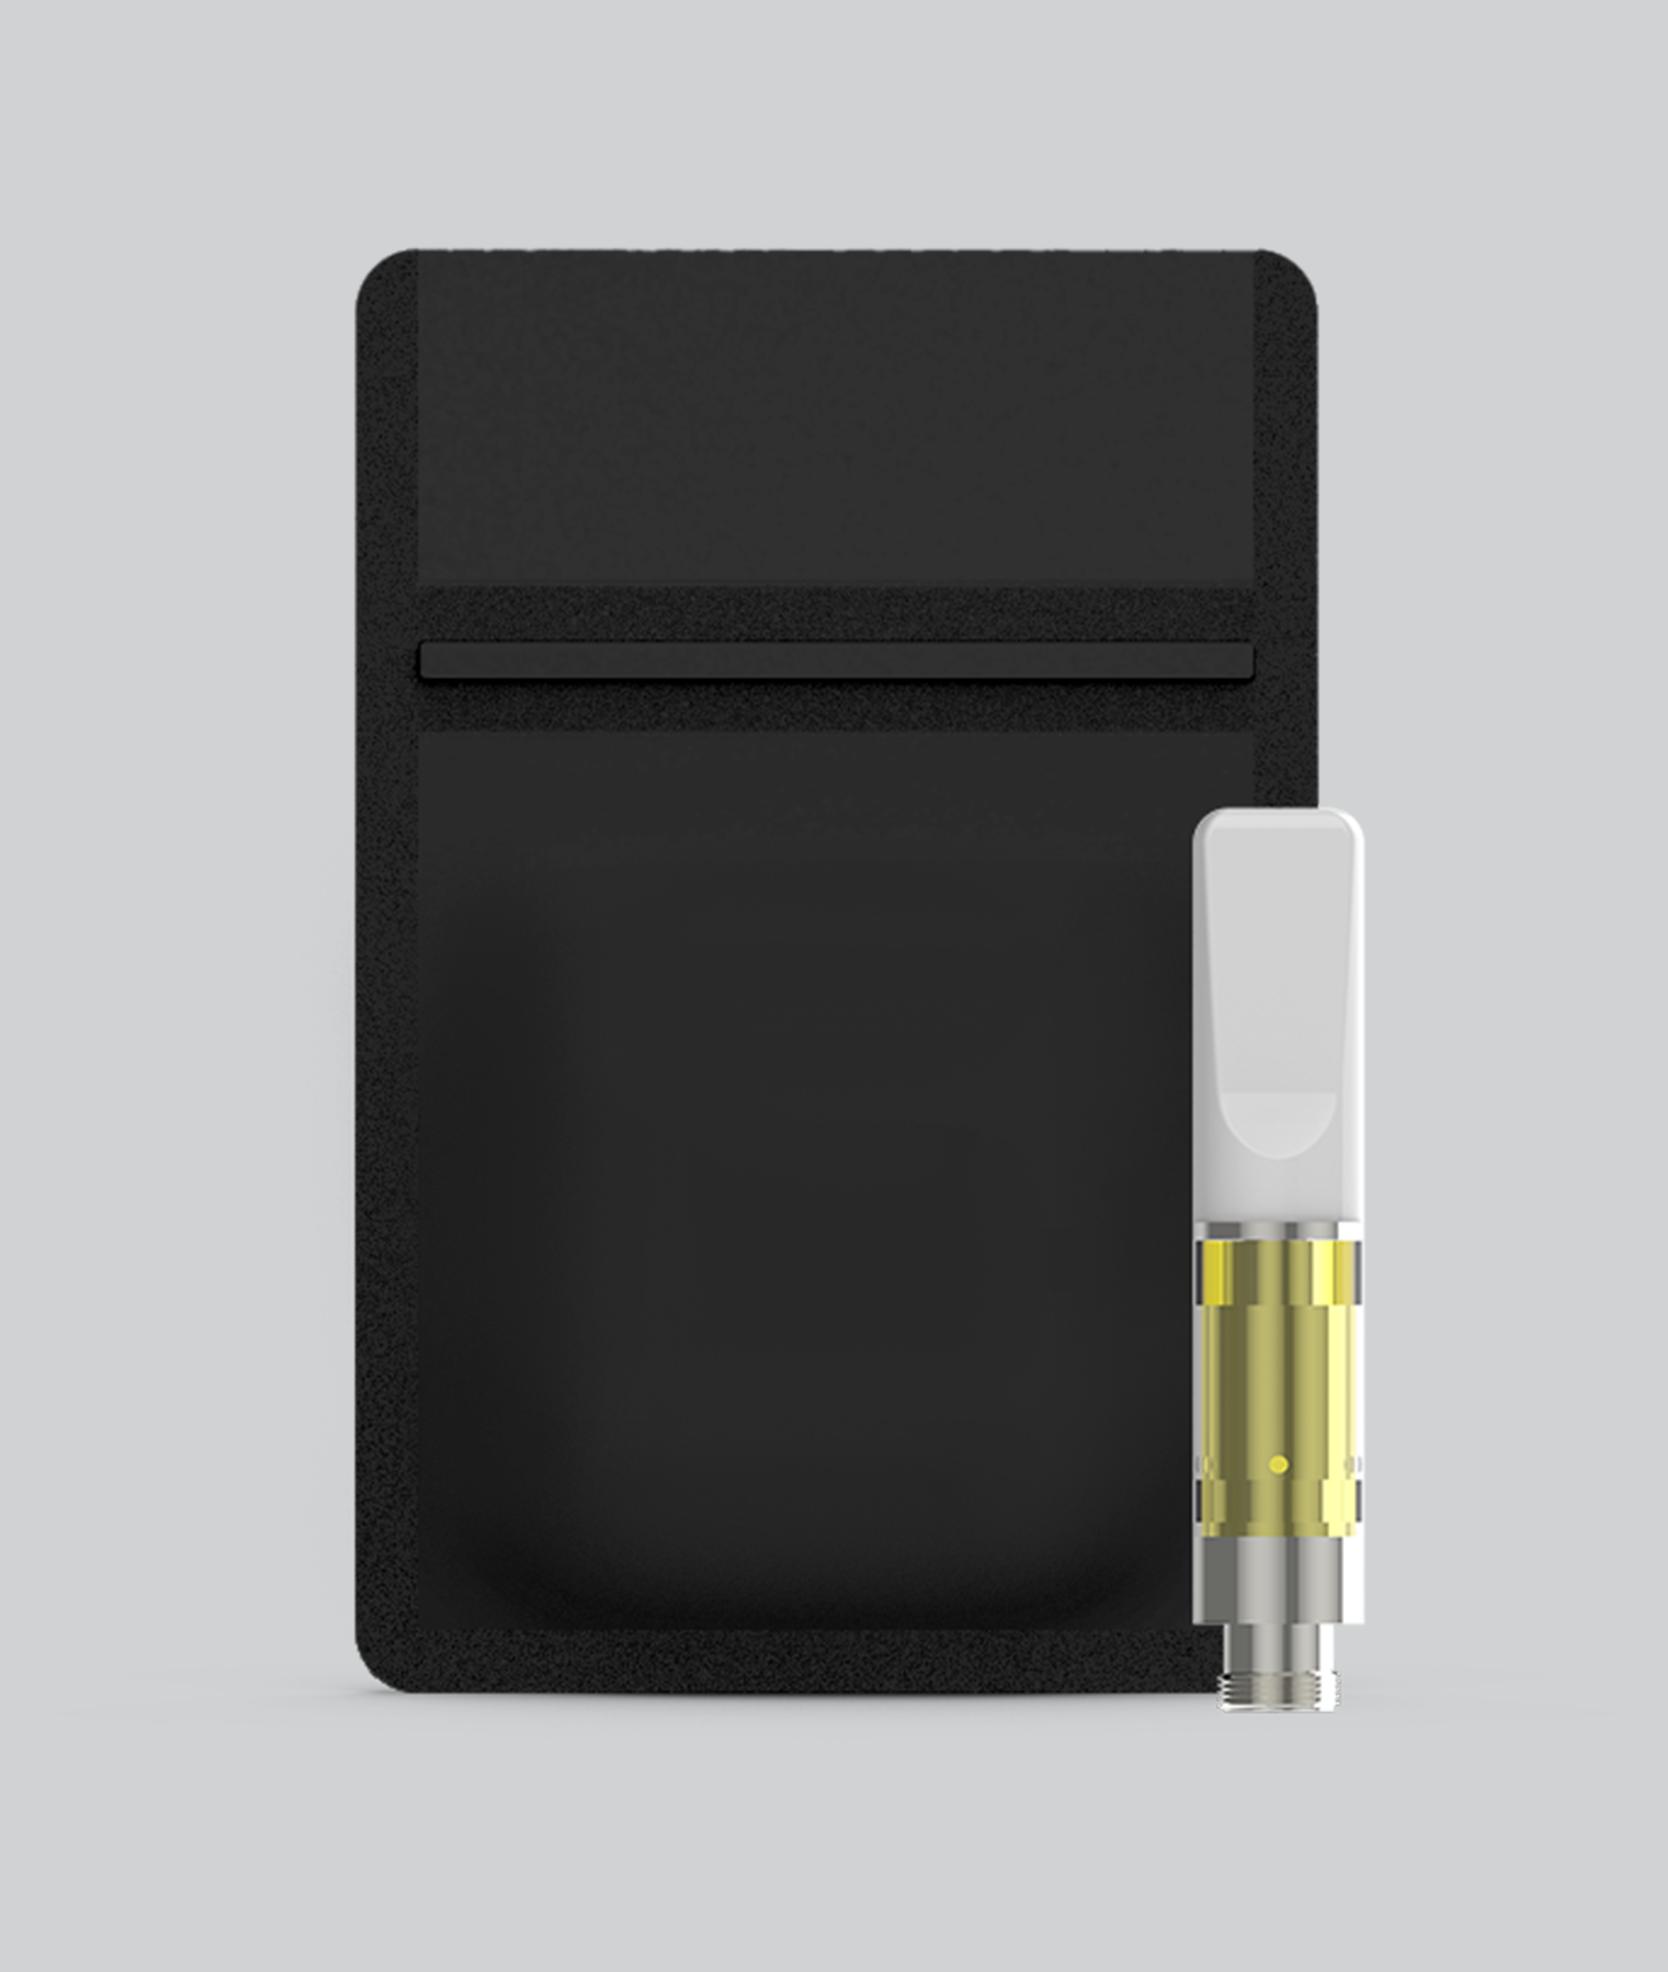 reddot-bag-vape-cartridge-packaging